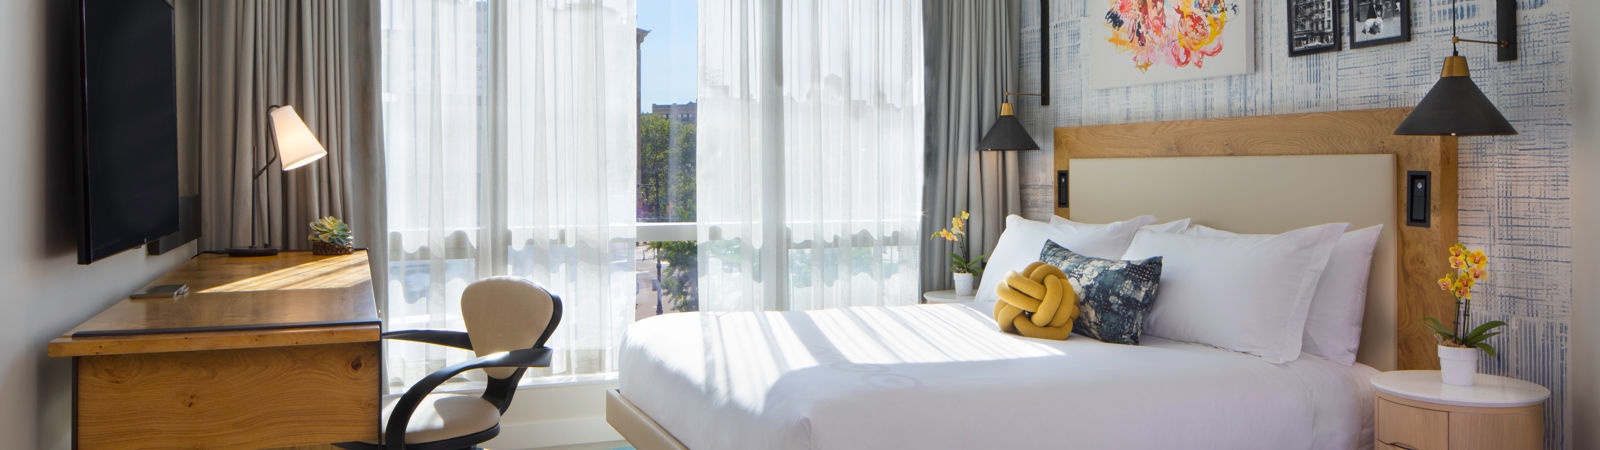 50bowery_DeluxeKing_Guestrooms